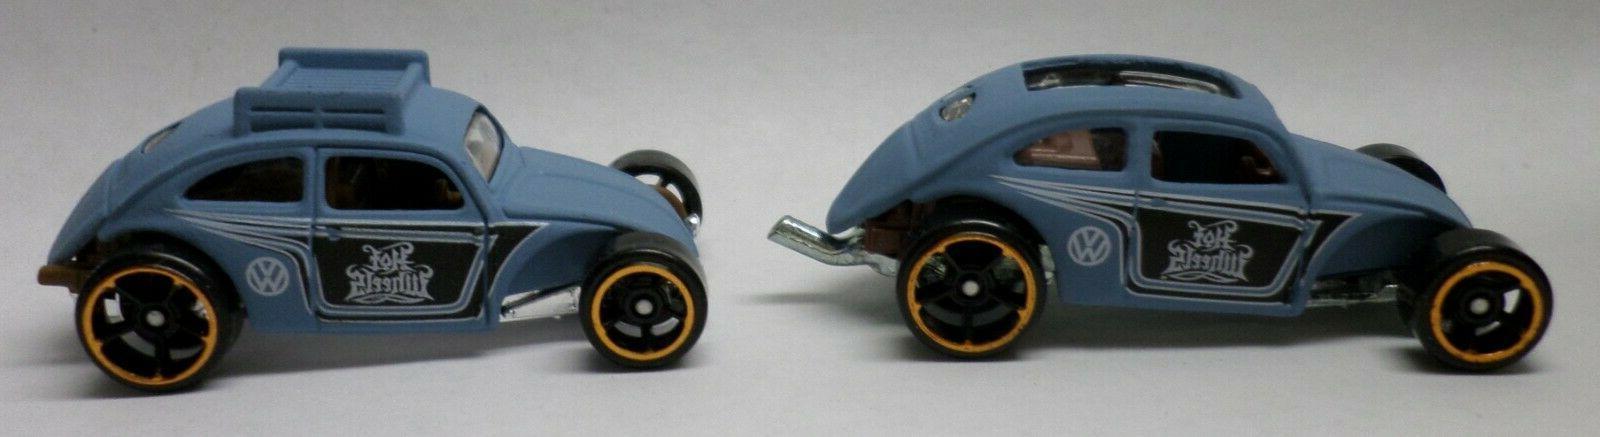 Hot 2 Lt Blue Beetle Roof Rack, Open Roof